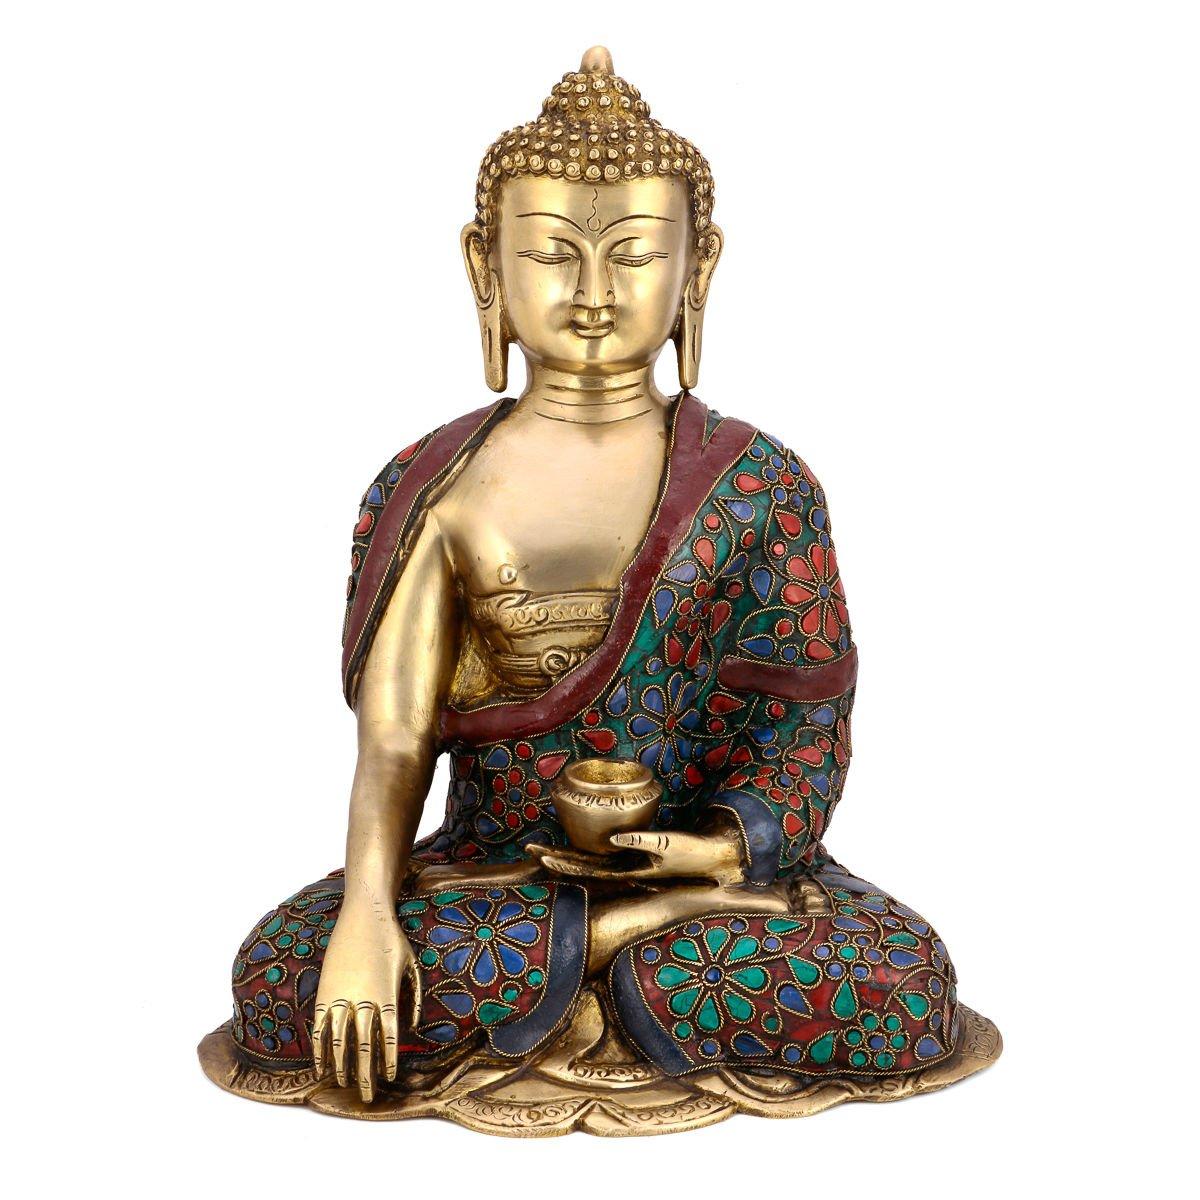 Collectible India Large Buddha Idol - Mudra Pose - Turquoise